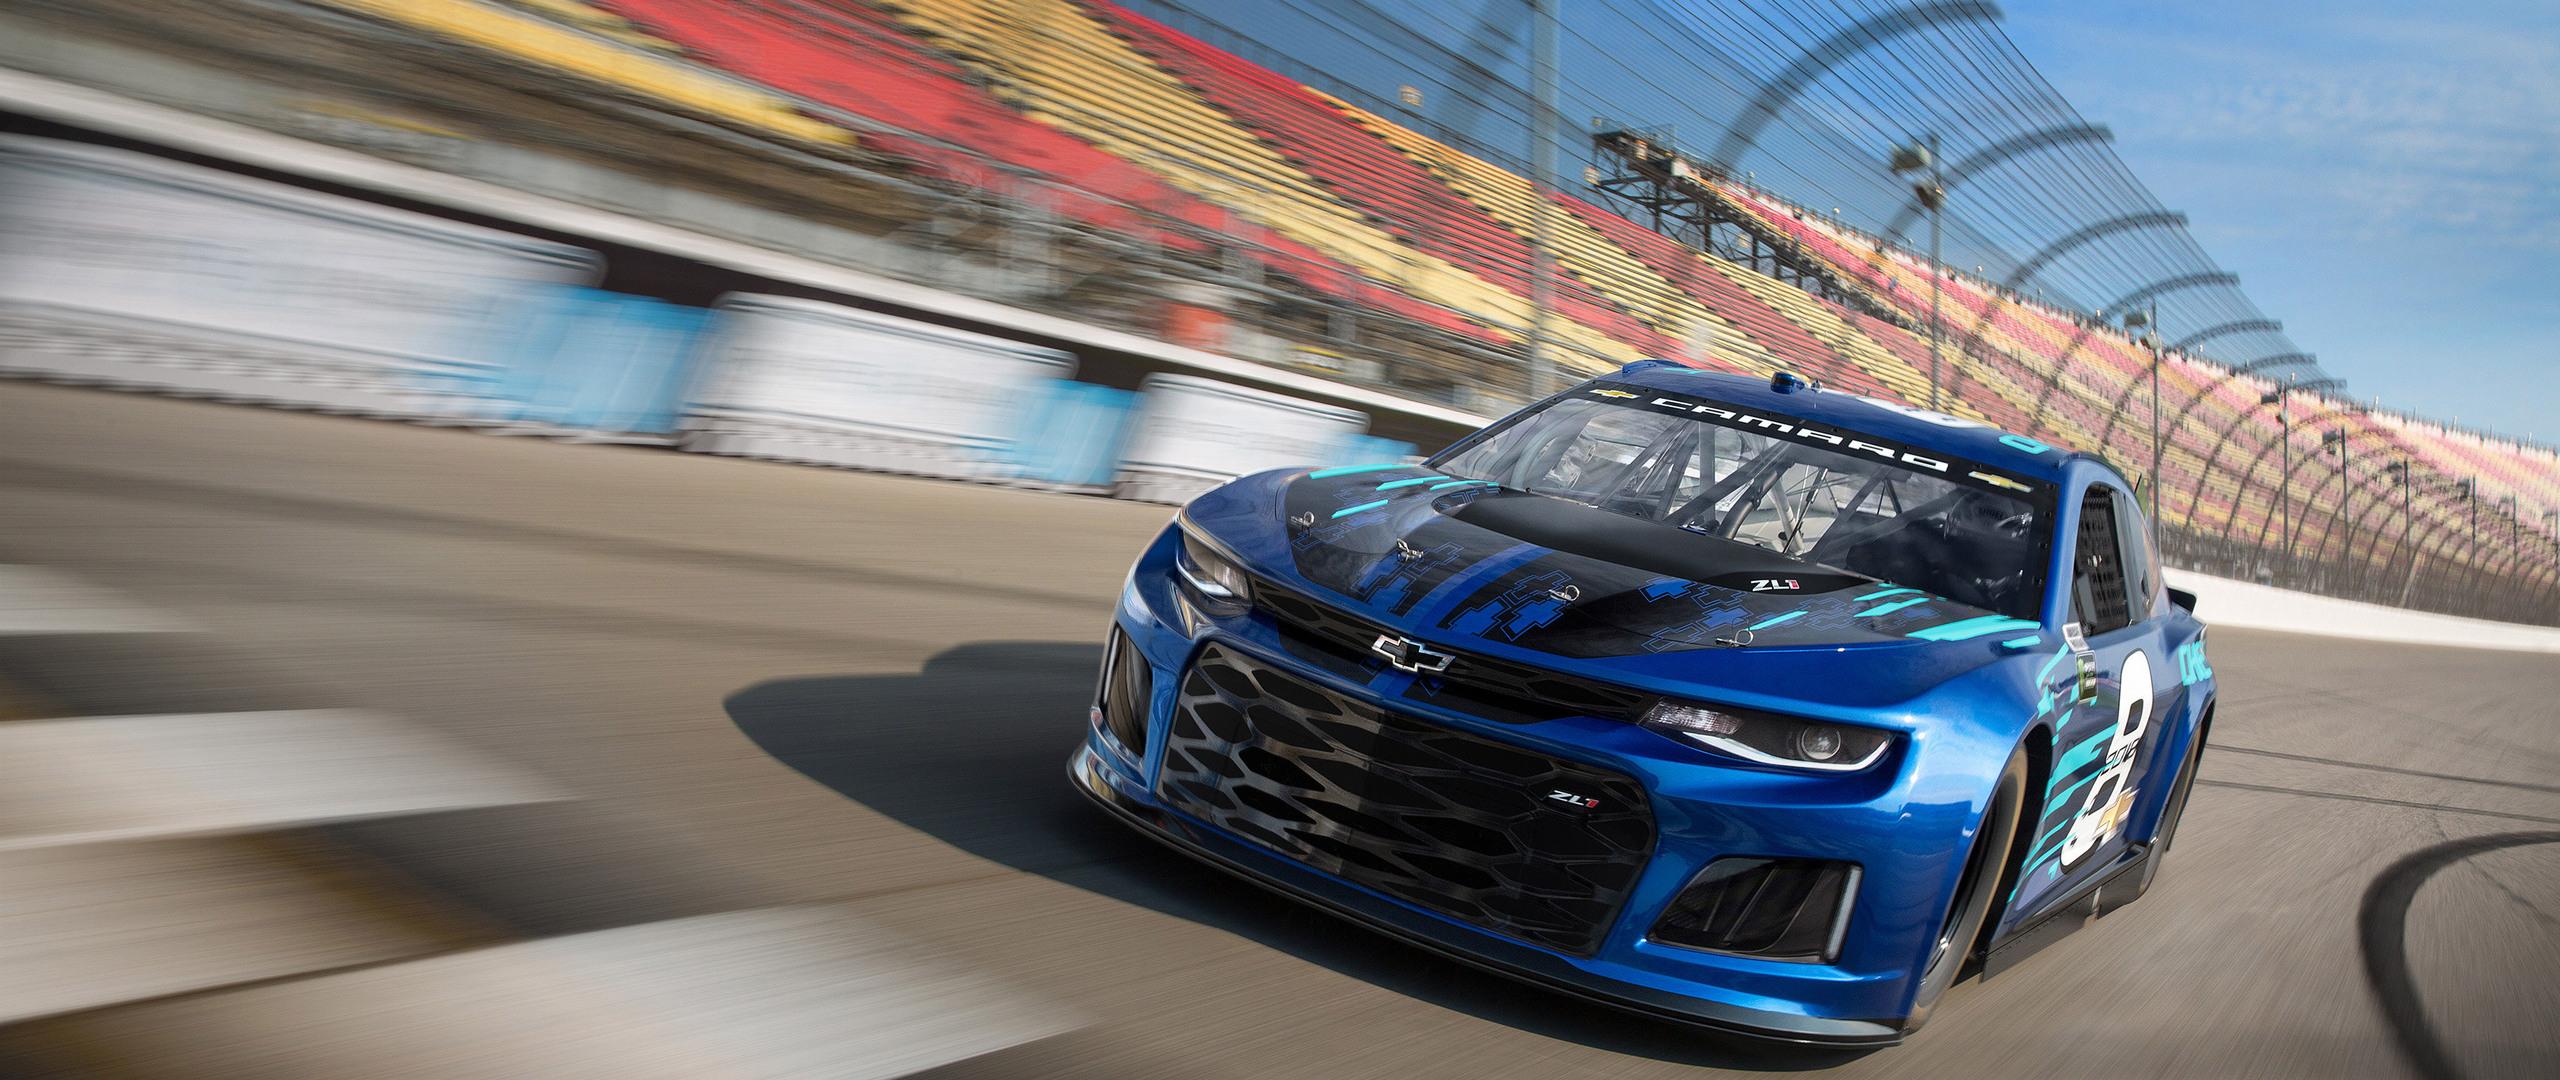 Wallpaper Chevrolet Camaro Zl1 Nascar Race Car 4k: 2560x1080 Chevrolet Camaro ZL1 NASCAR 2018 2560x1080